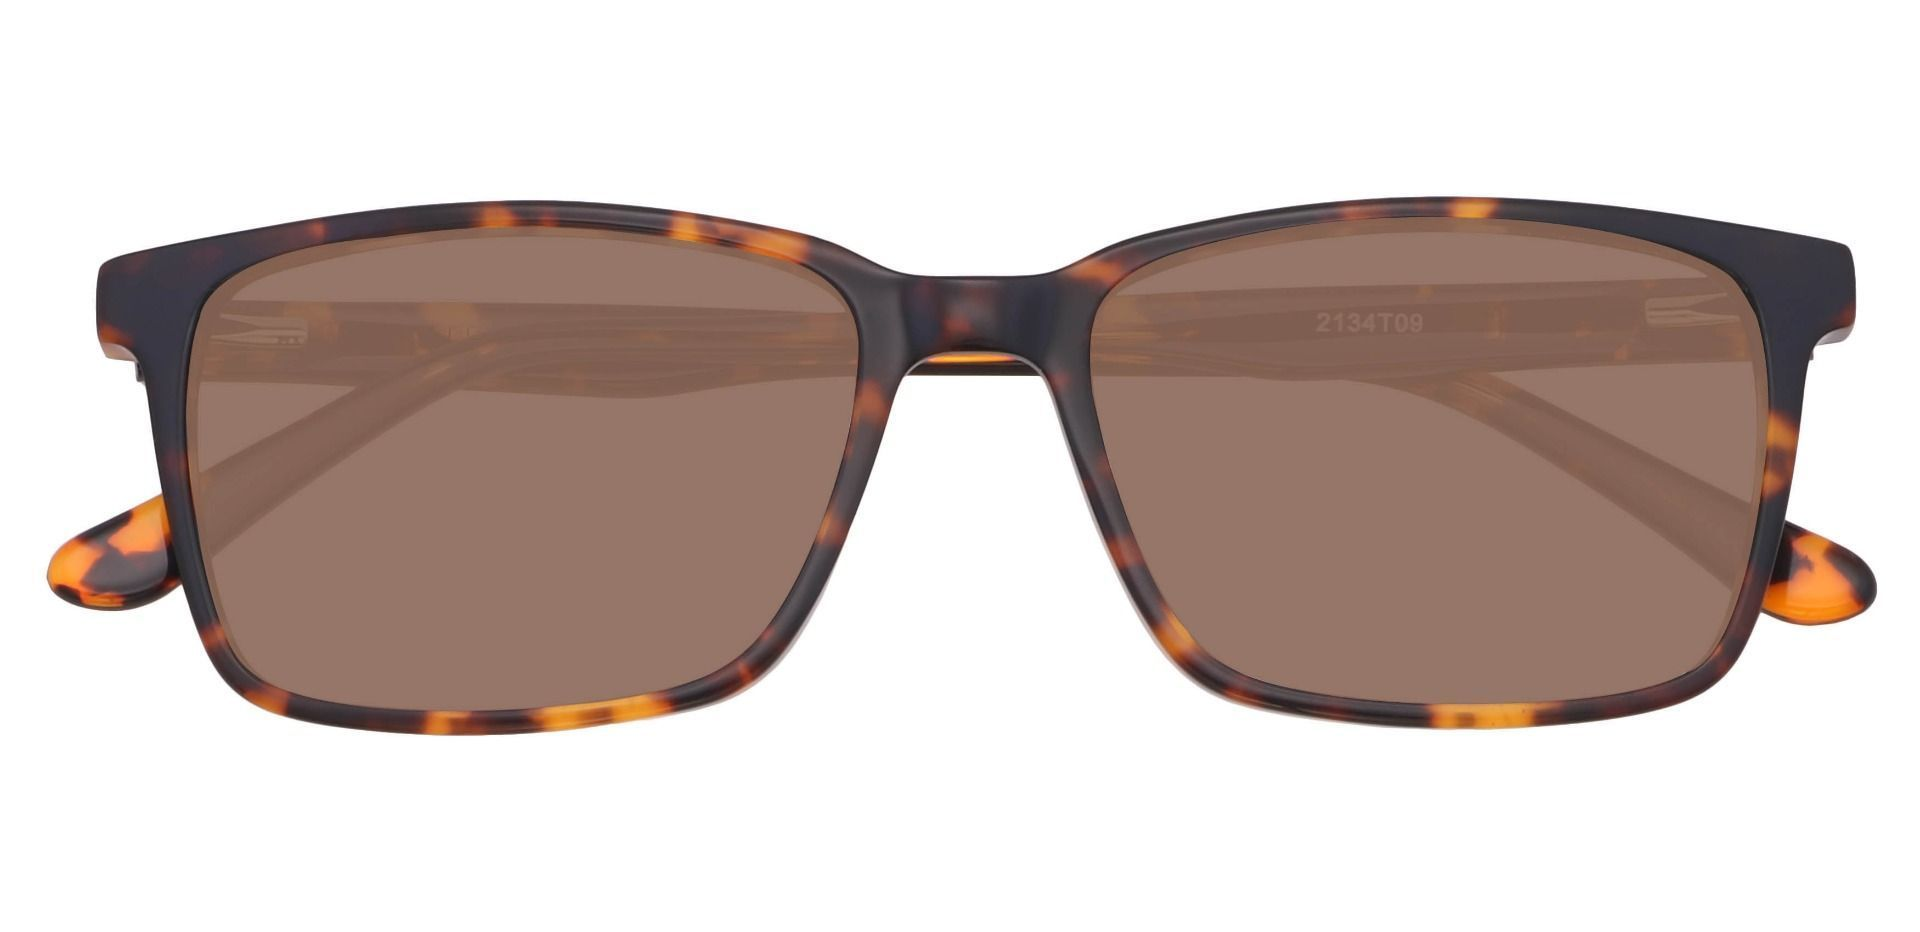 Venice Rectangle Reading Sunglasses - Tortoise Frame With Brown Lenses